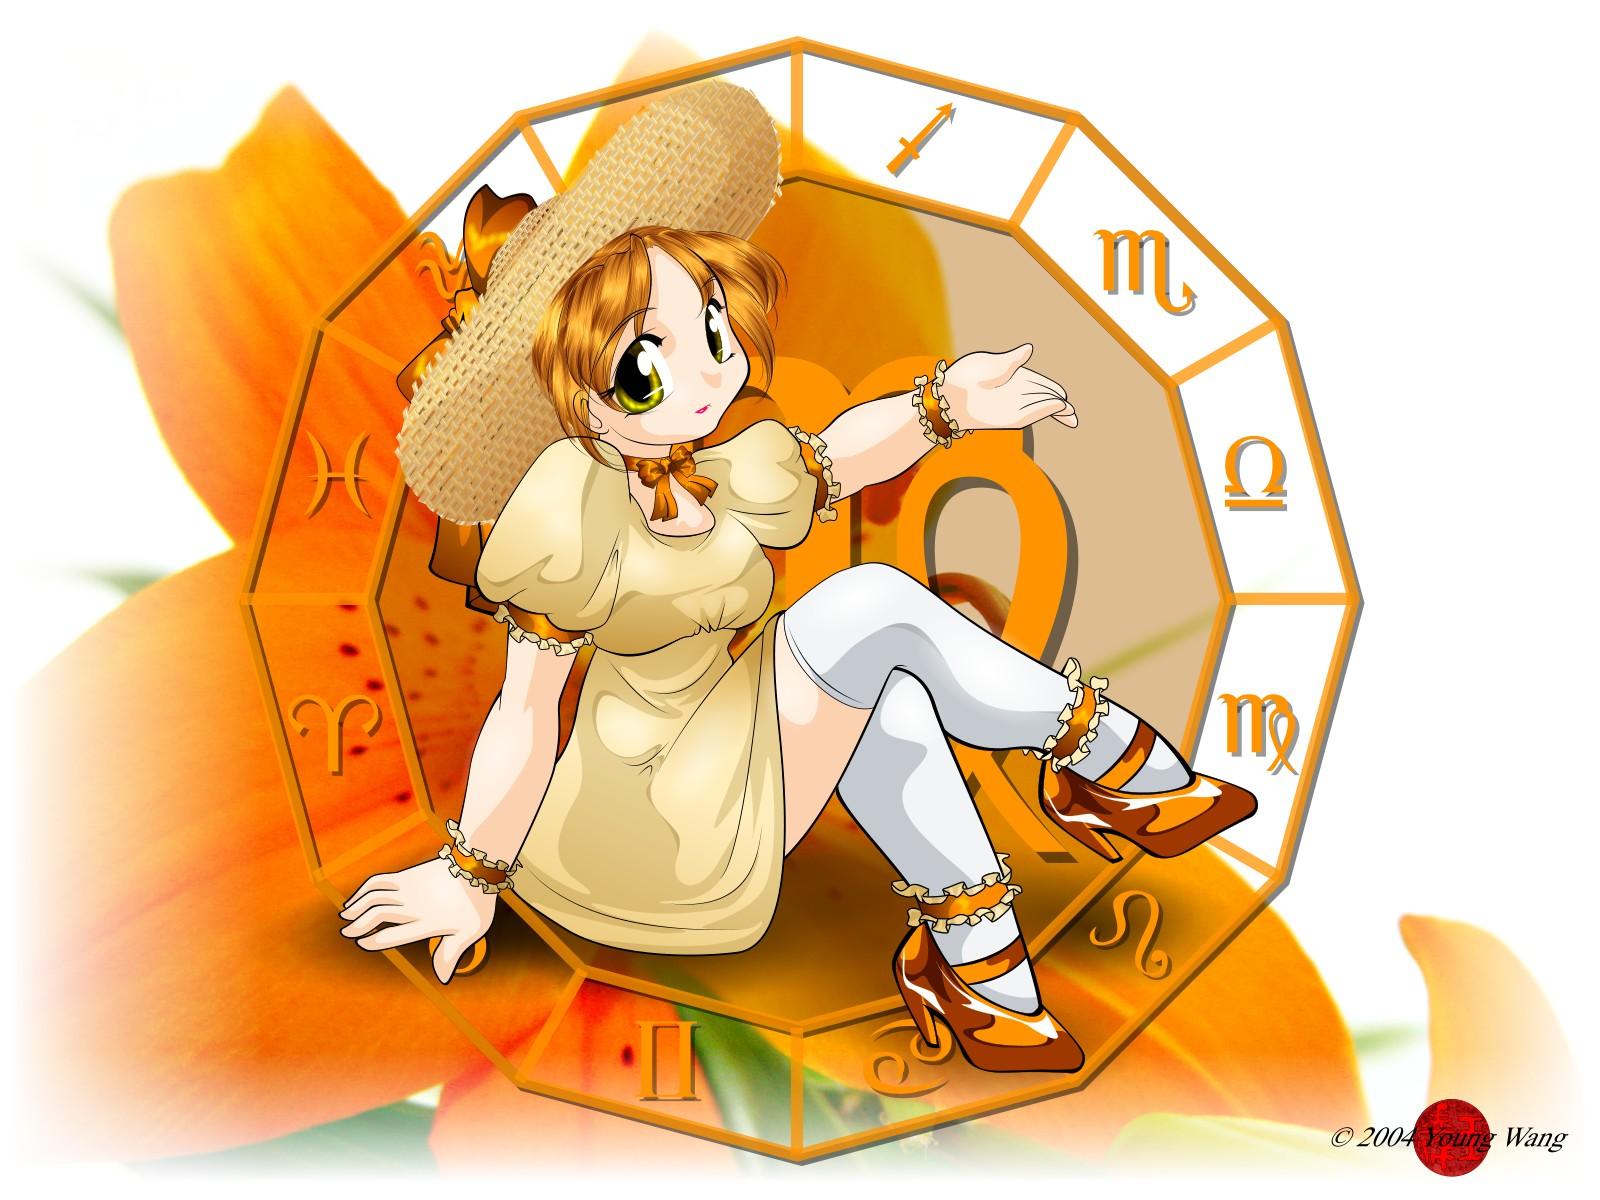 Zodiac Virgo By Hoihoisan